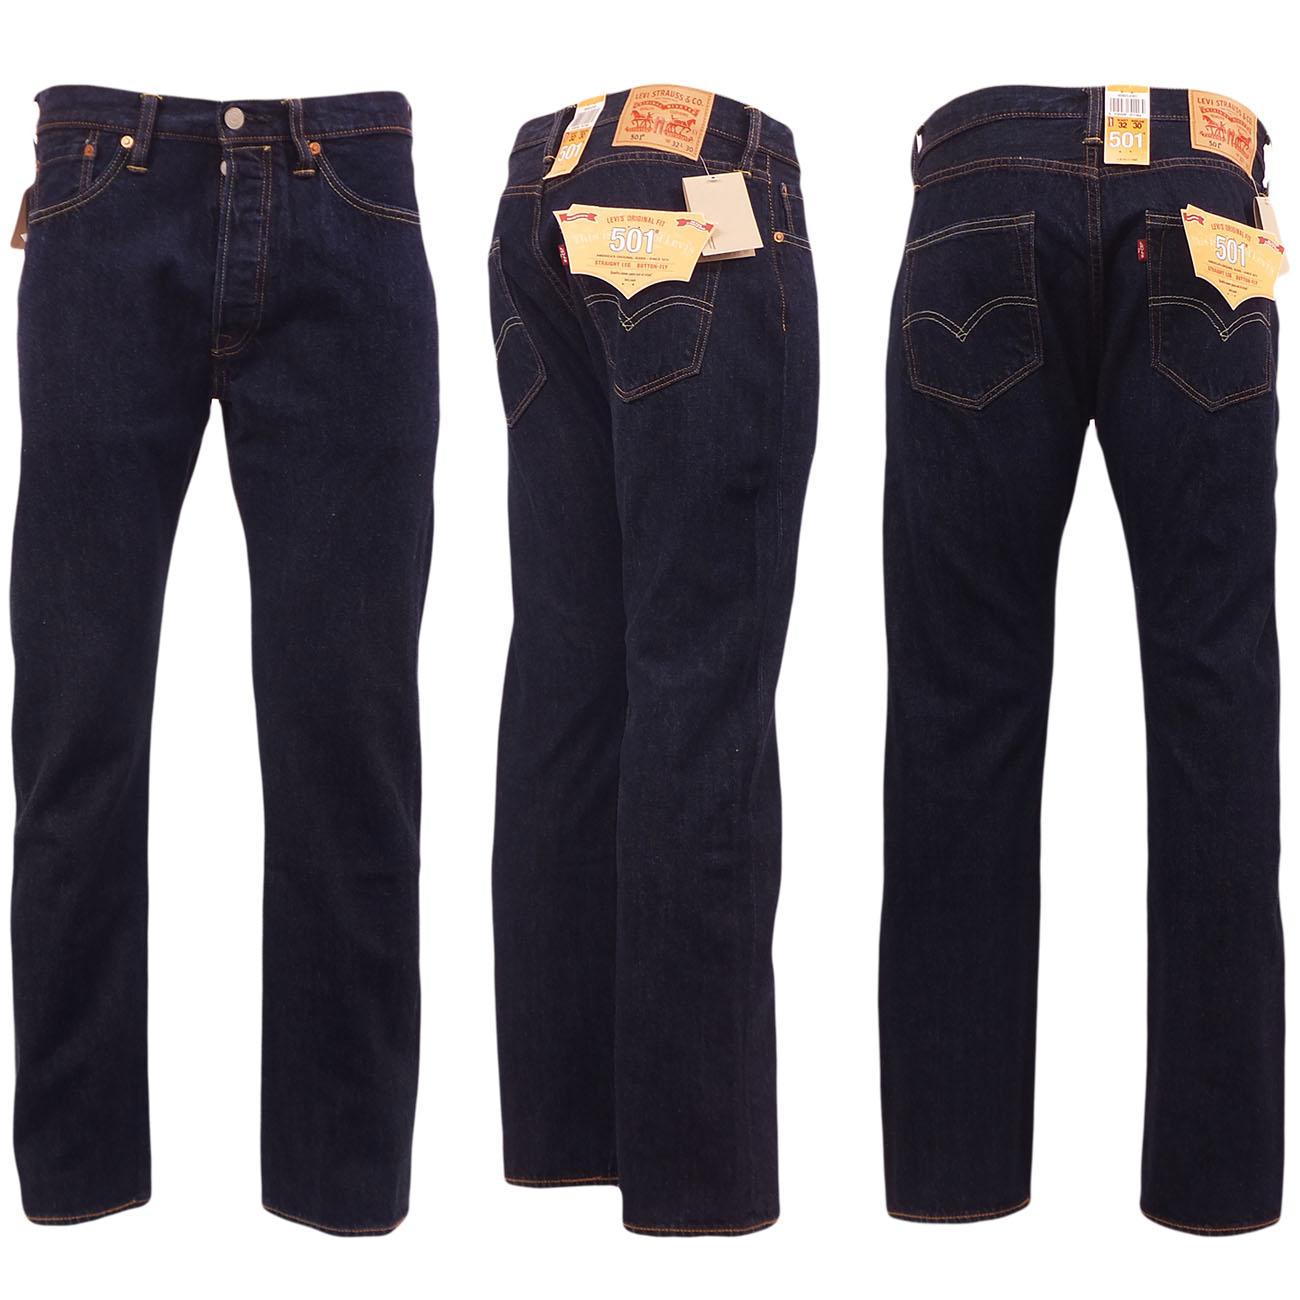 Levi 501 jeans mens original levi 39 s strauss denim straight for Men s shirt sizes explained